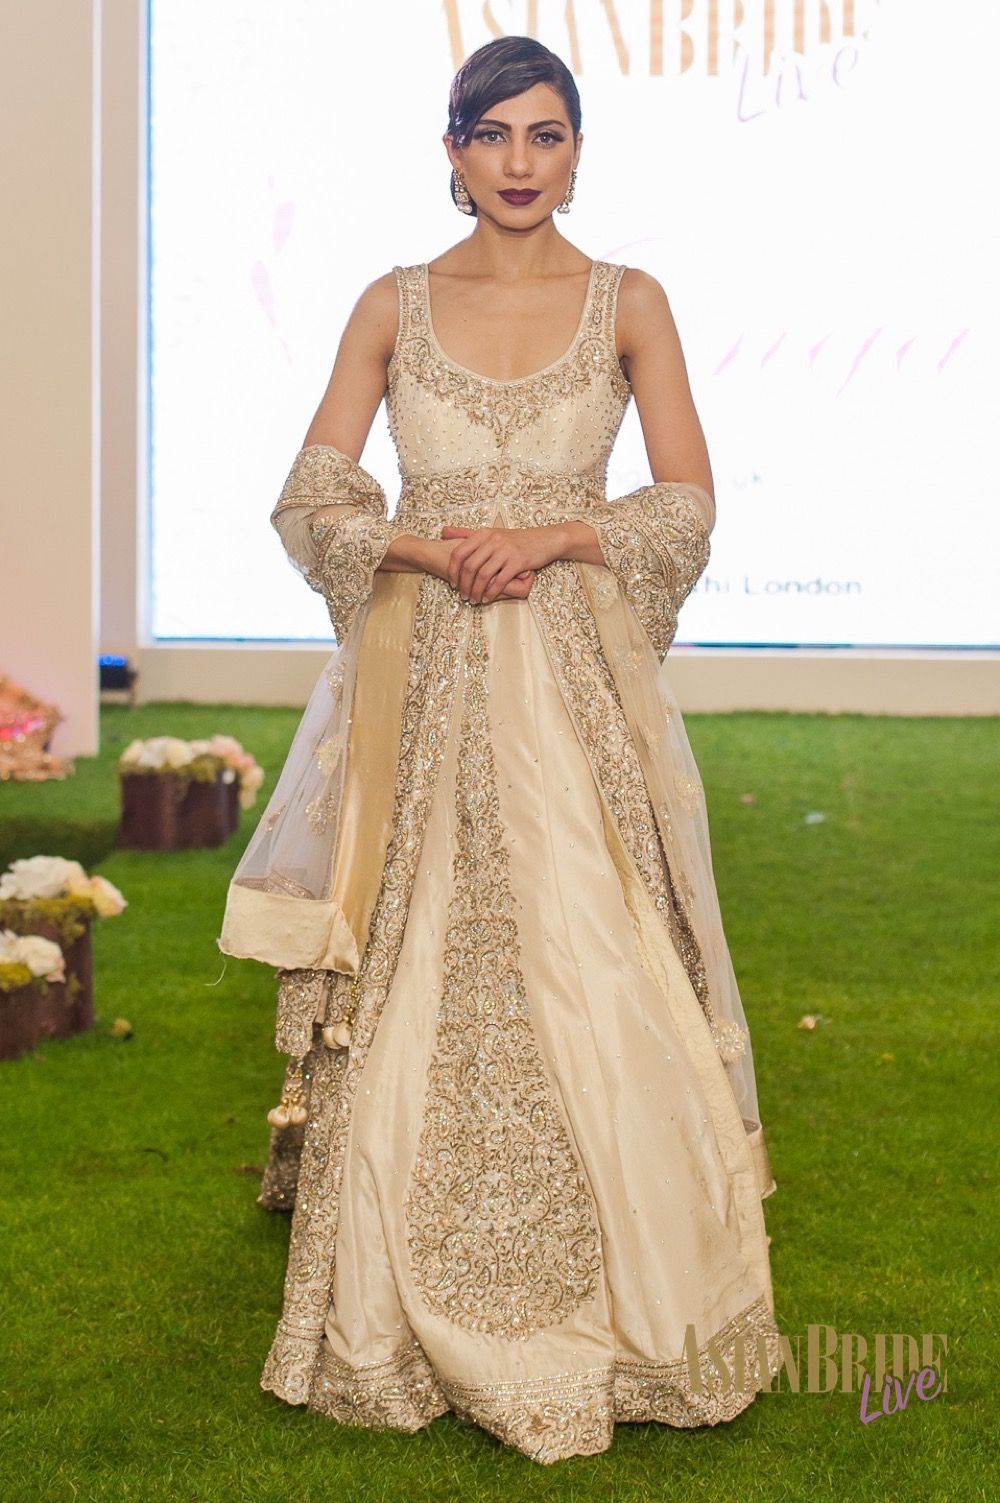 Gold Cream Bridal Lengha Dress Mongas Indian Pakistani Wedding